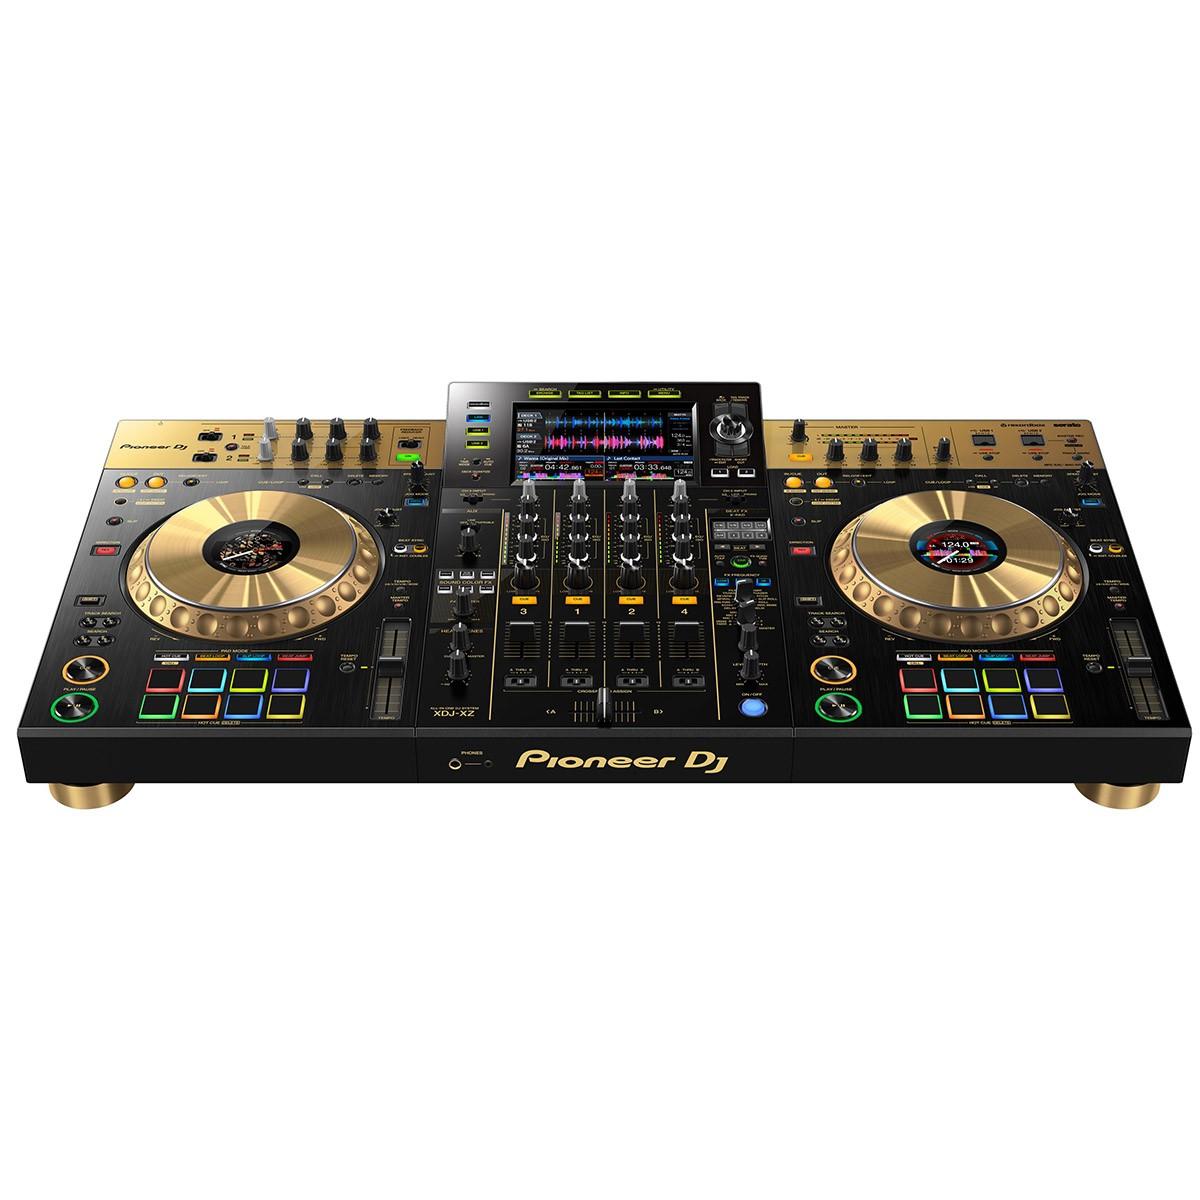 Controladora Pioneer DJ XDJ XZ-N